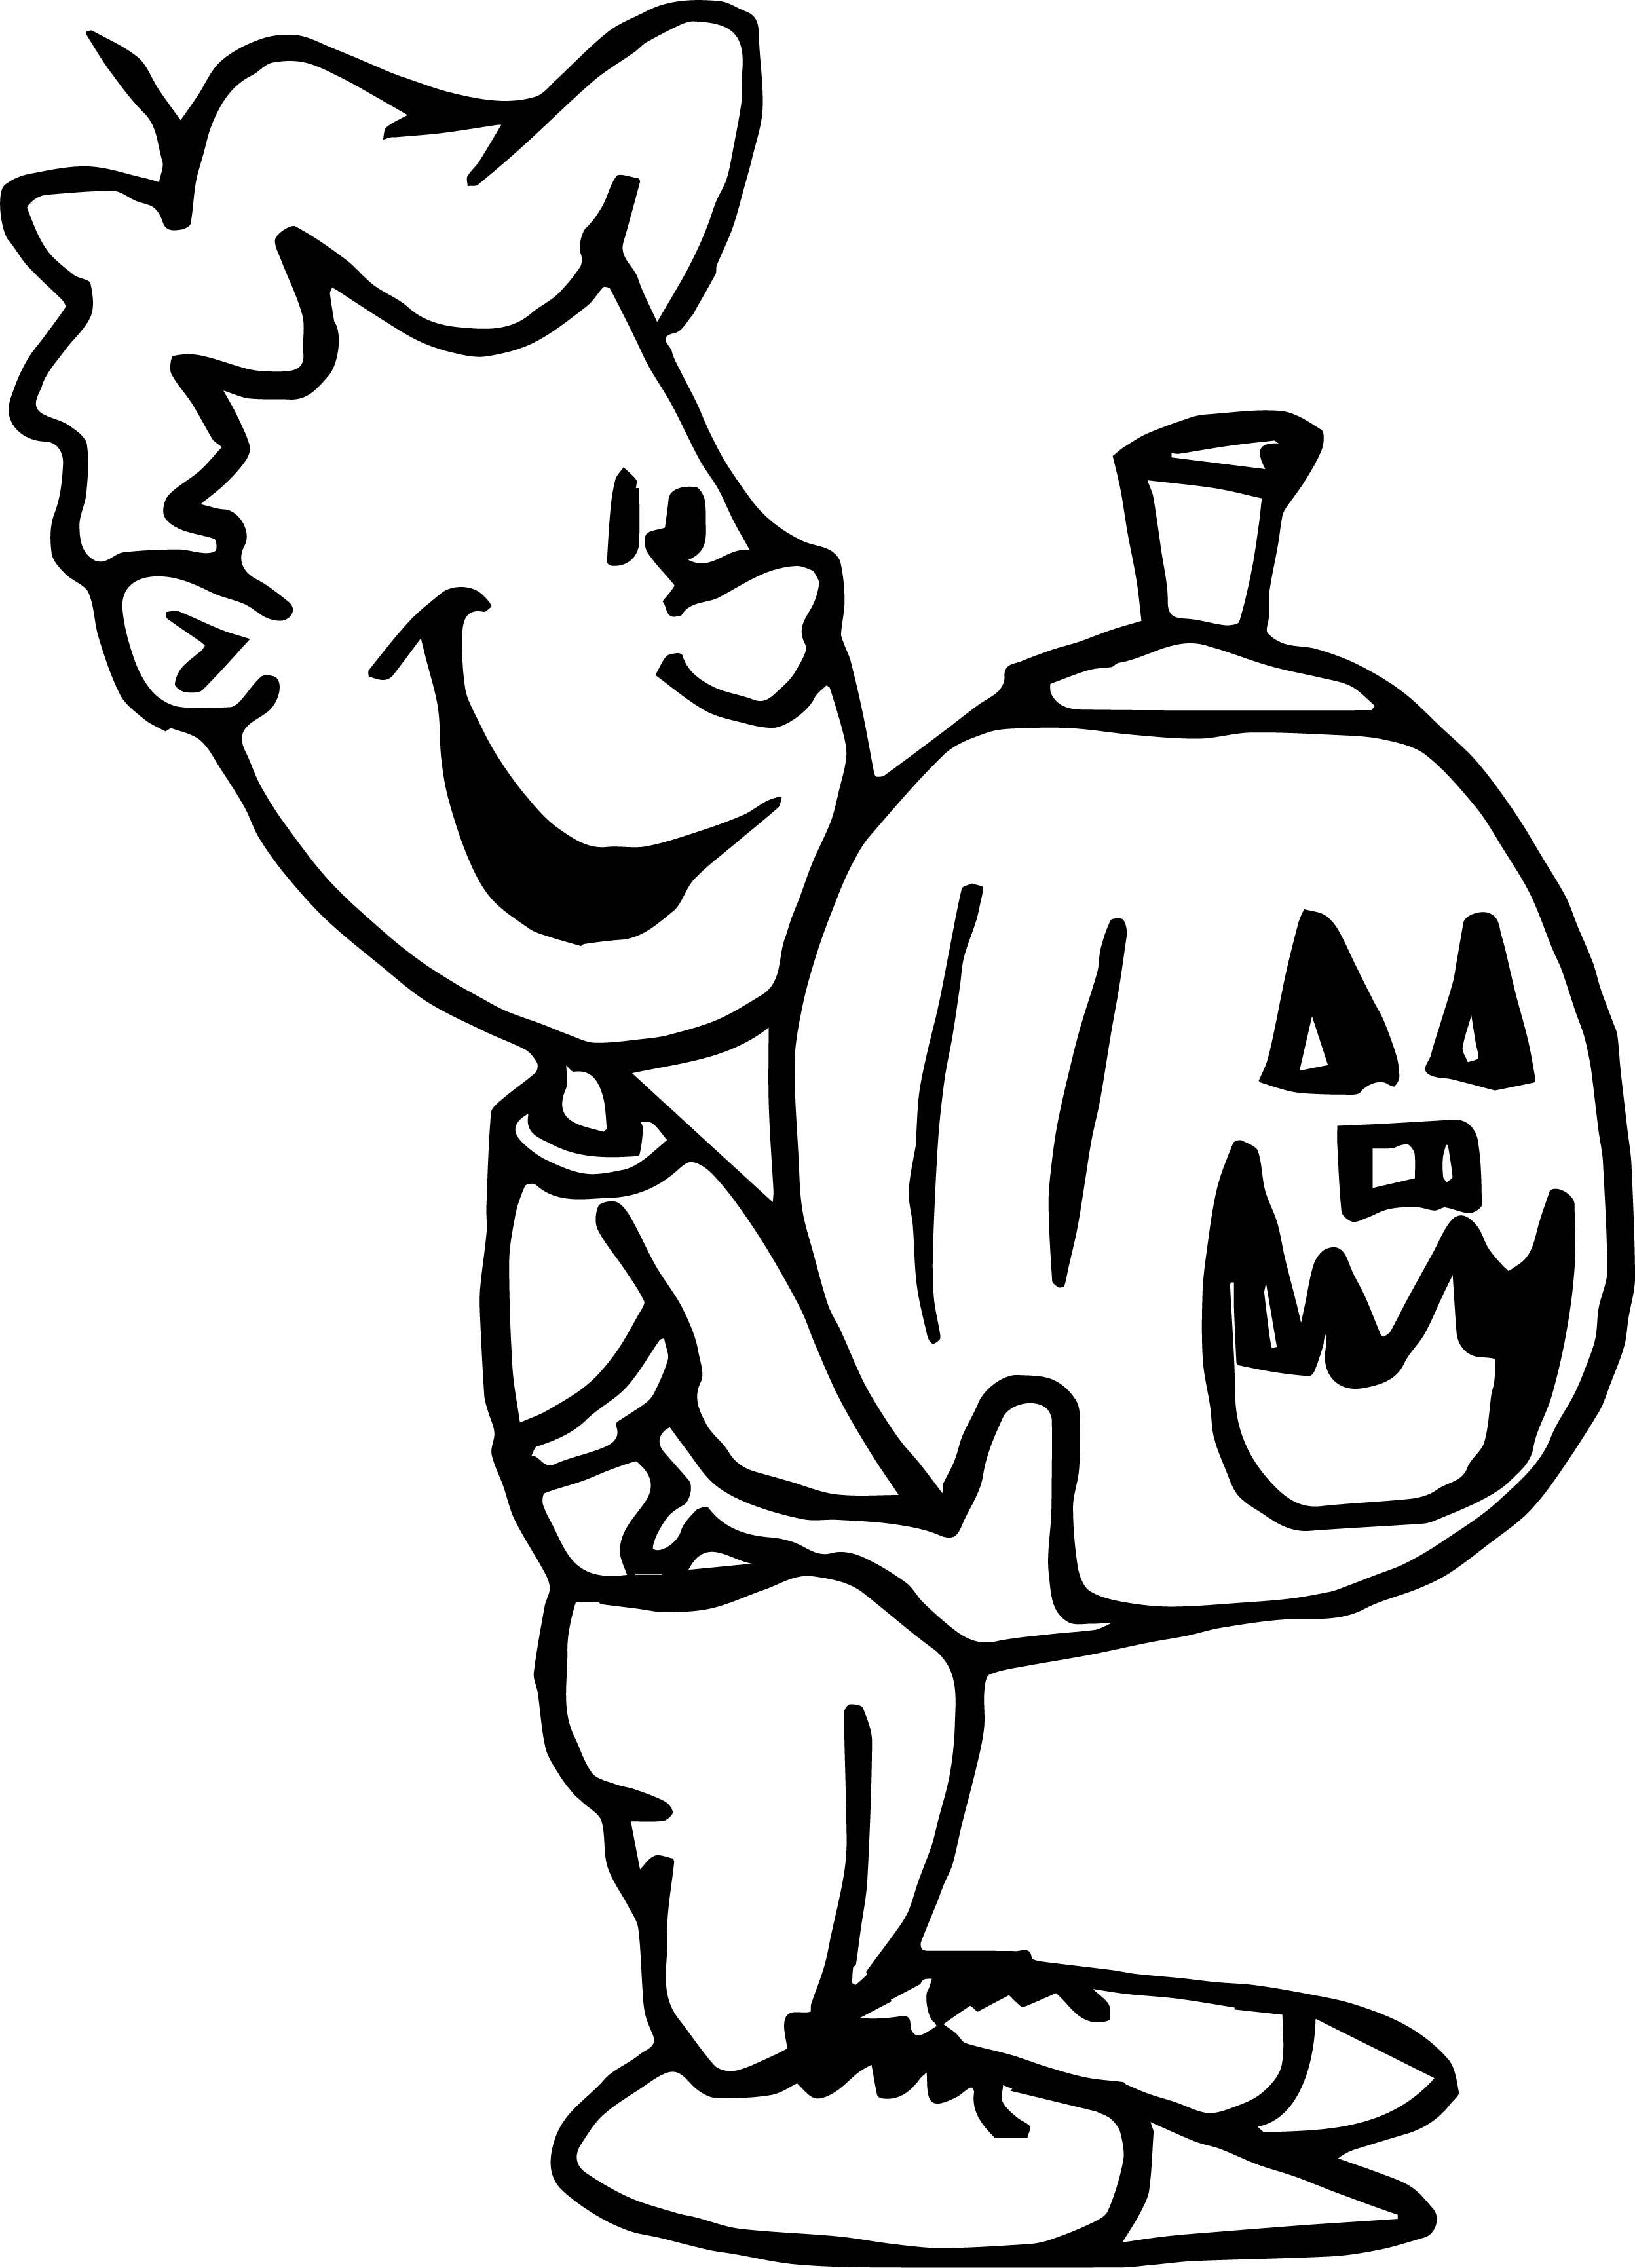 Chrismas Boy Holding Pumpkin Coloring Page | Wecoloringpage.com